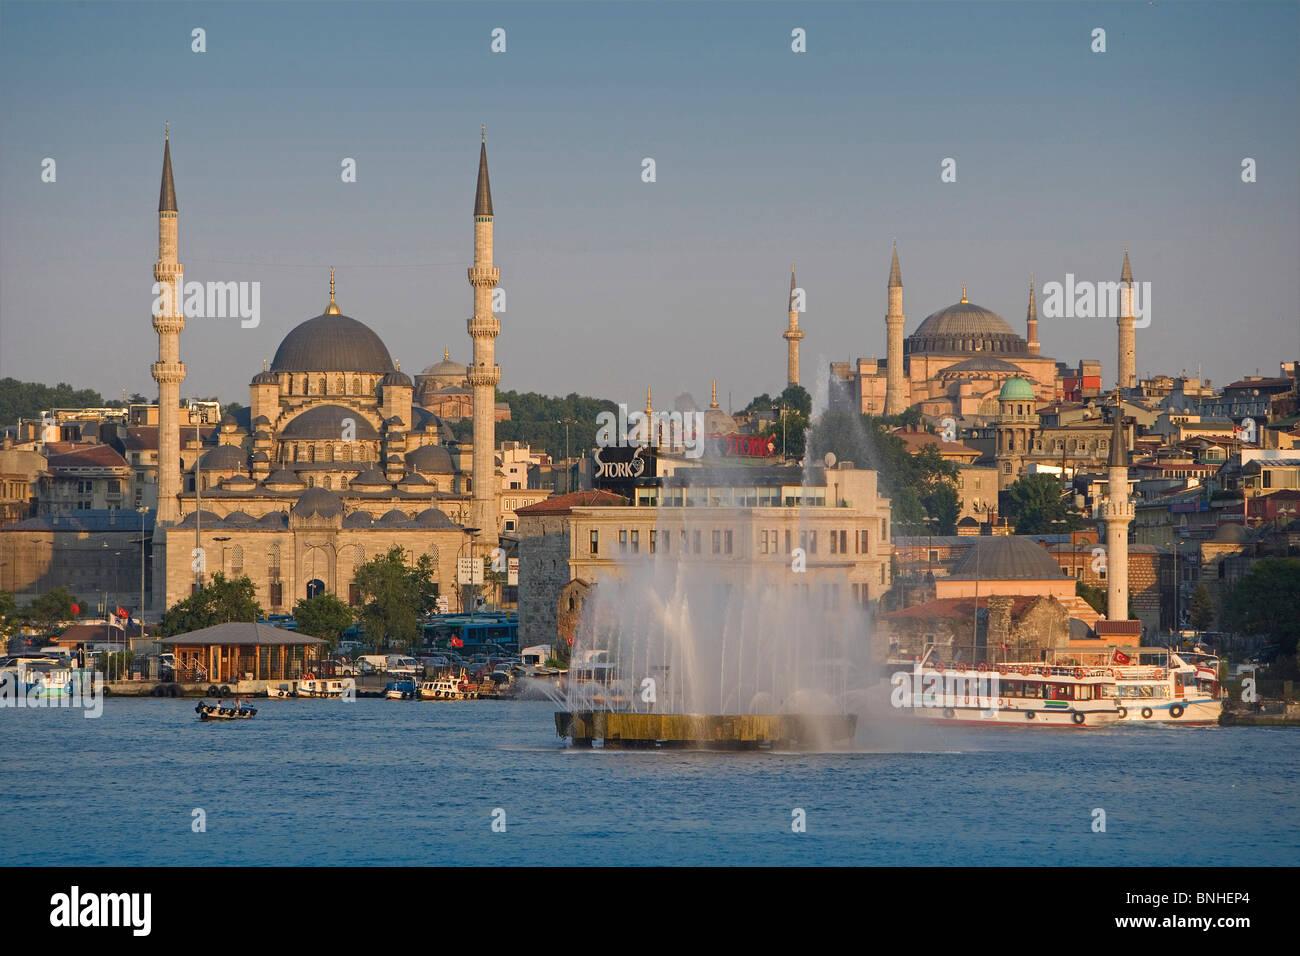 Juni 2008 Türkei Istanbul Stadt Goldene Horn Moscheen Brunnen Küste zu sehen Stockbild